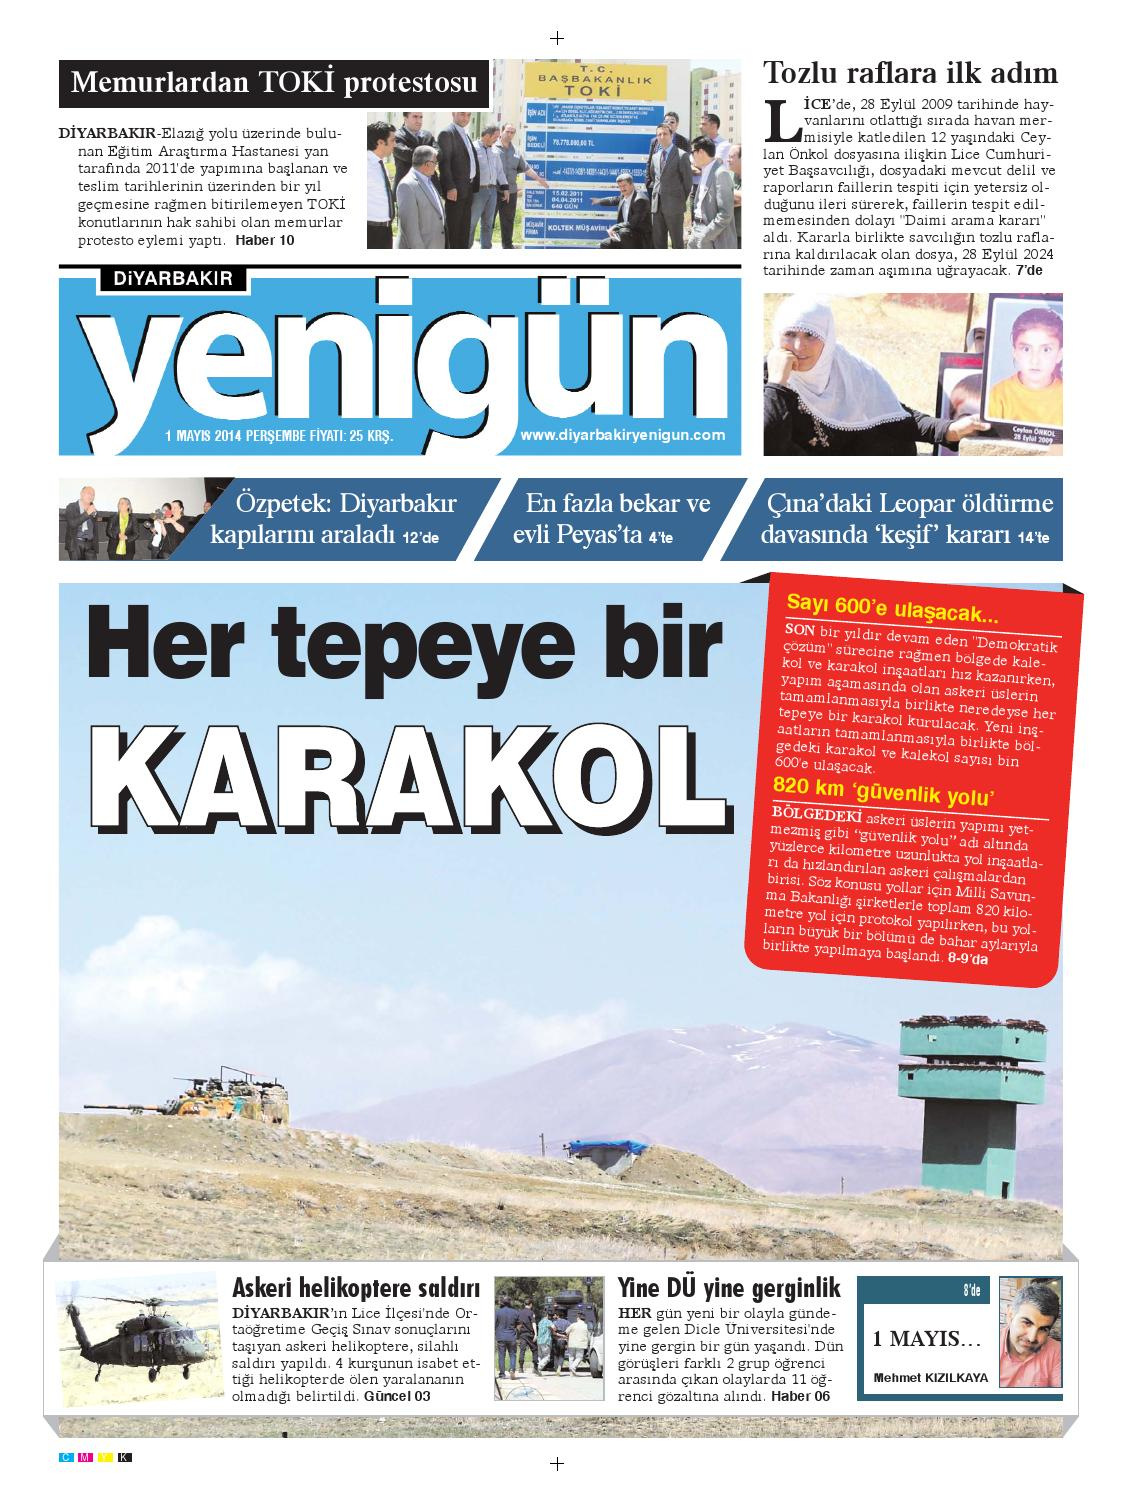 Diyarbakir Yenigun Gazetesi 1 Mayis 2014 By Osman Ergun Issuu